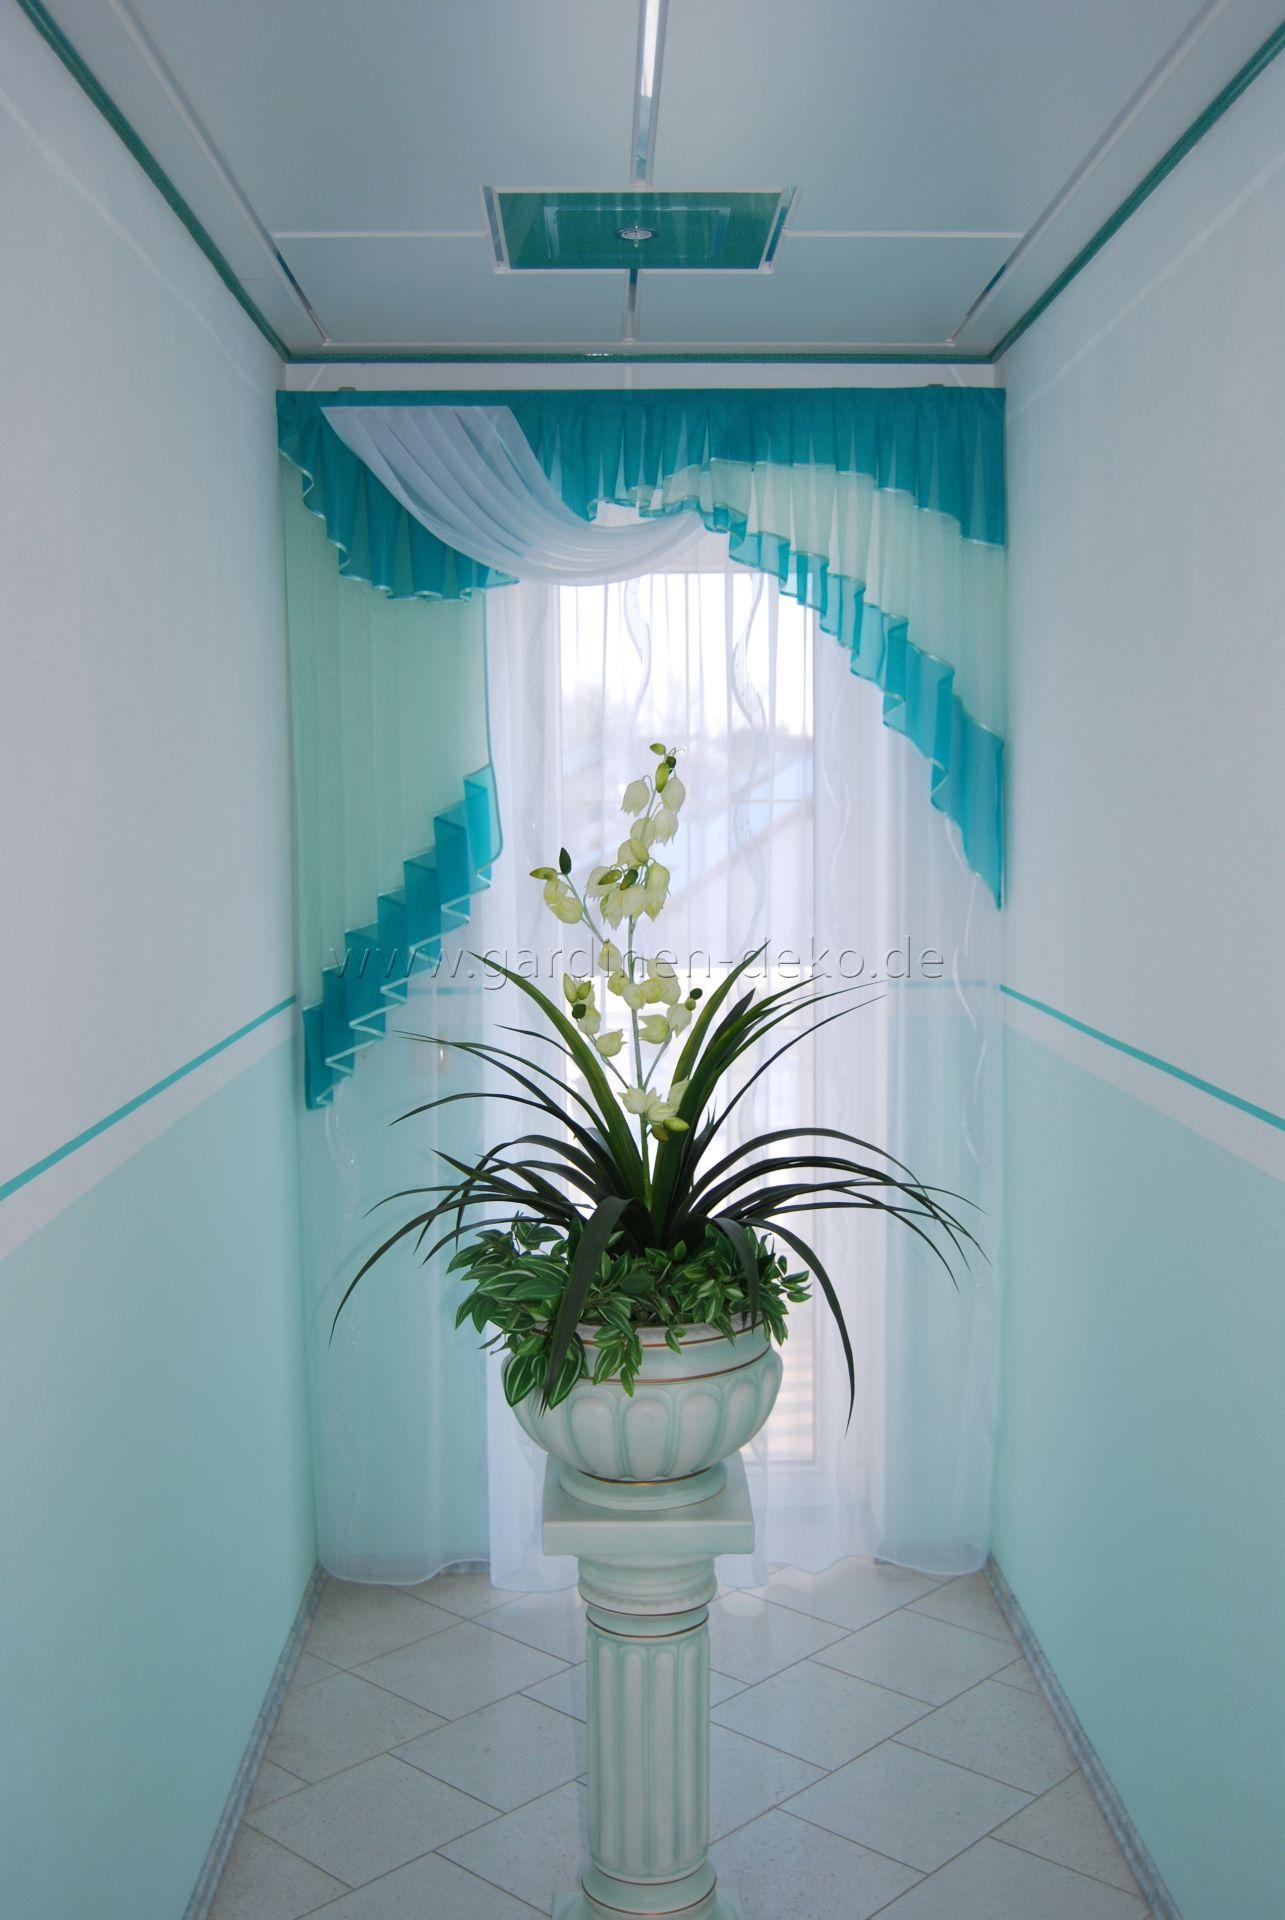 klassisch gehaltener vorhang mit schals in feinem t rkis. Black Bedroom Furniture Sets. Home Design Ideas